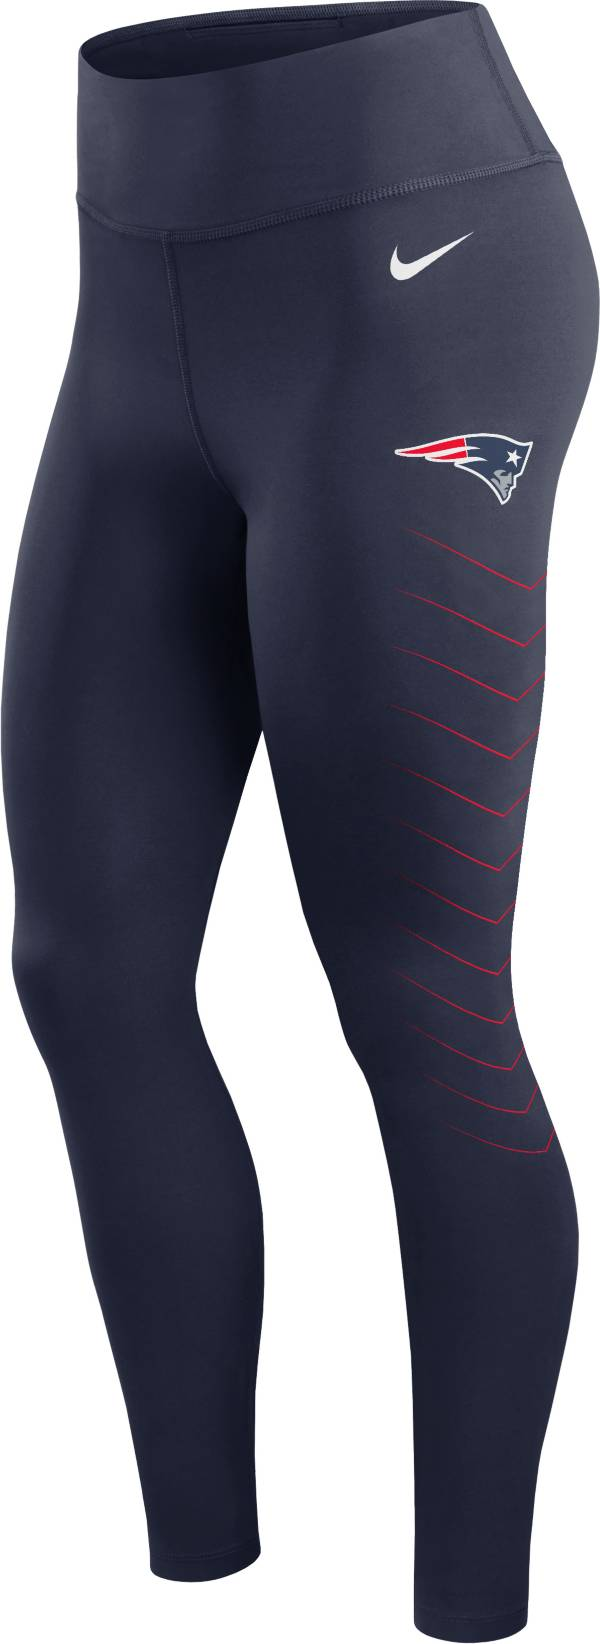 Nike Women's New England Patriots Dri-FIT Navy Performance Leggings product image